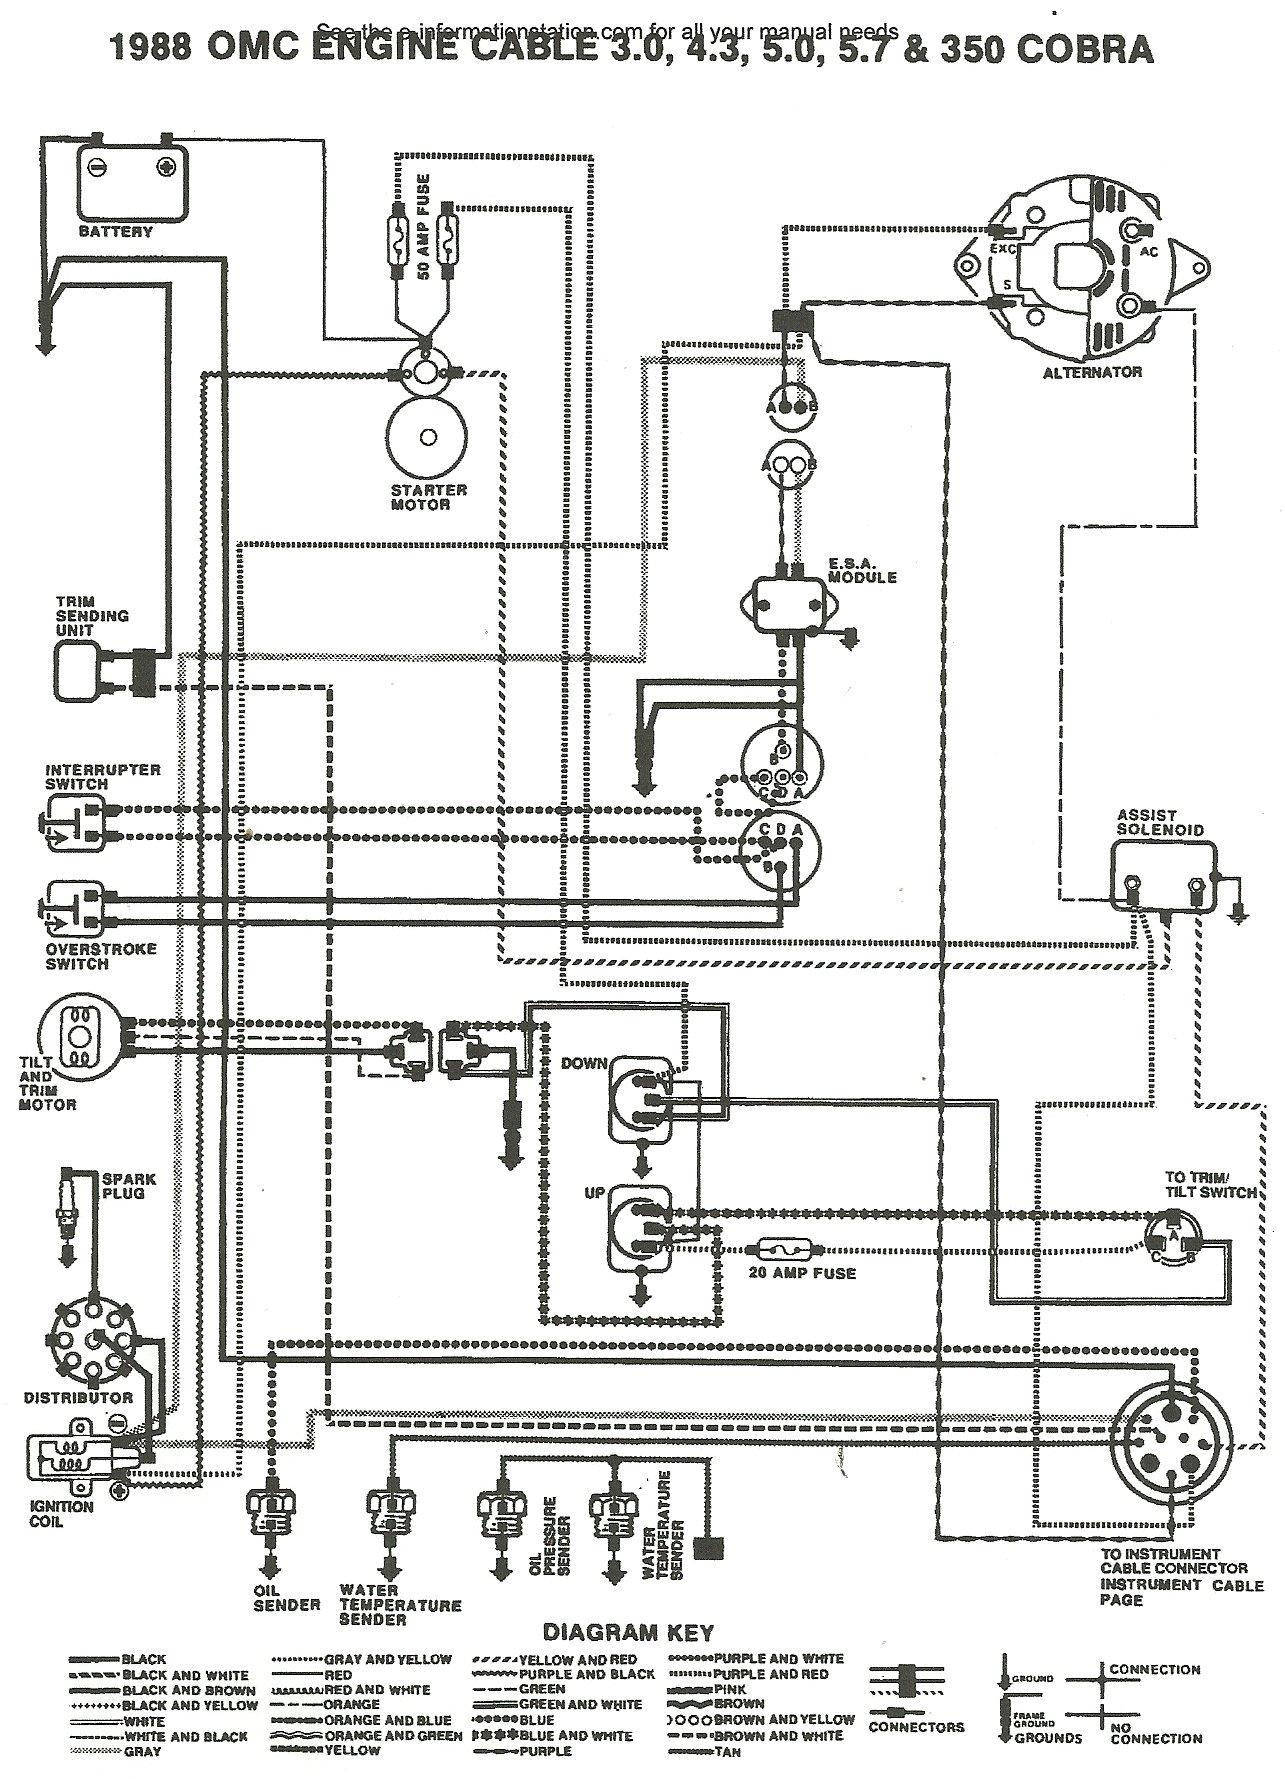 1987 Bayliner 2855 Command Wiring Diagrams -2011 Dodge Journey Fuse Diagram  | Begeboy Wiring Diagram Source | Bayliner Capri Wiring Diagram |  | Begeboy Wiring Diagram Source